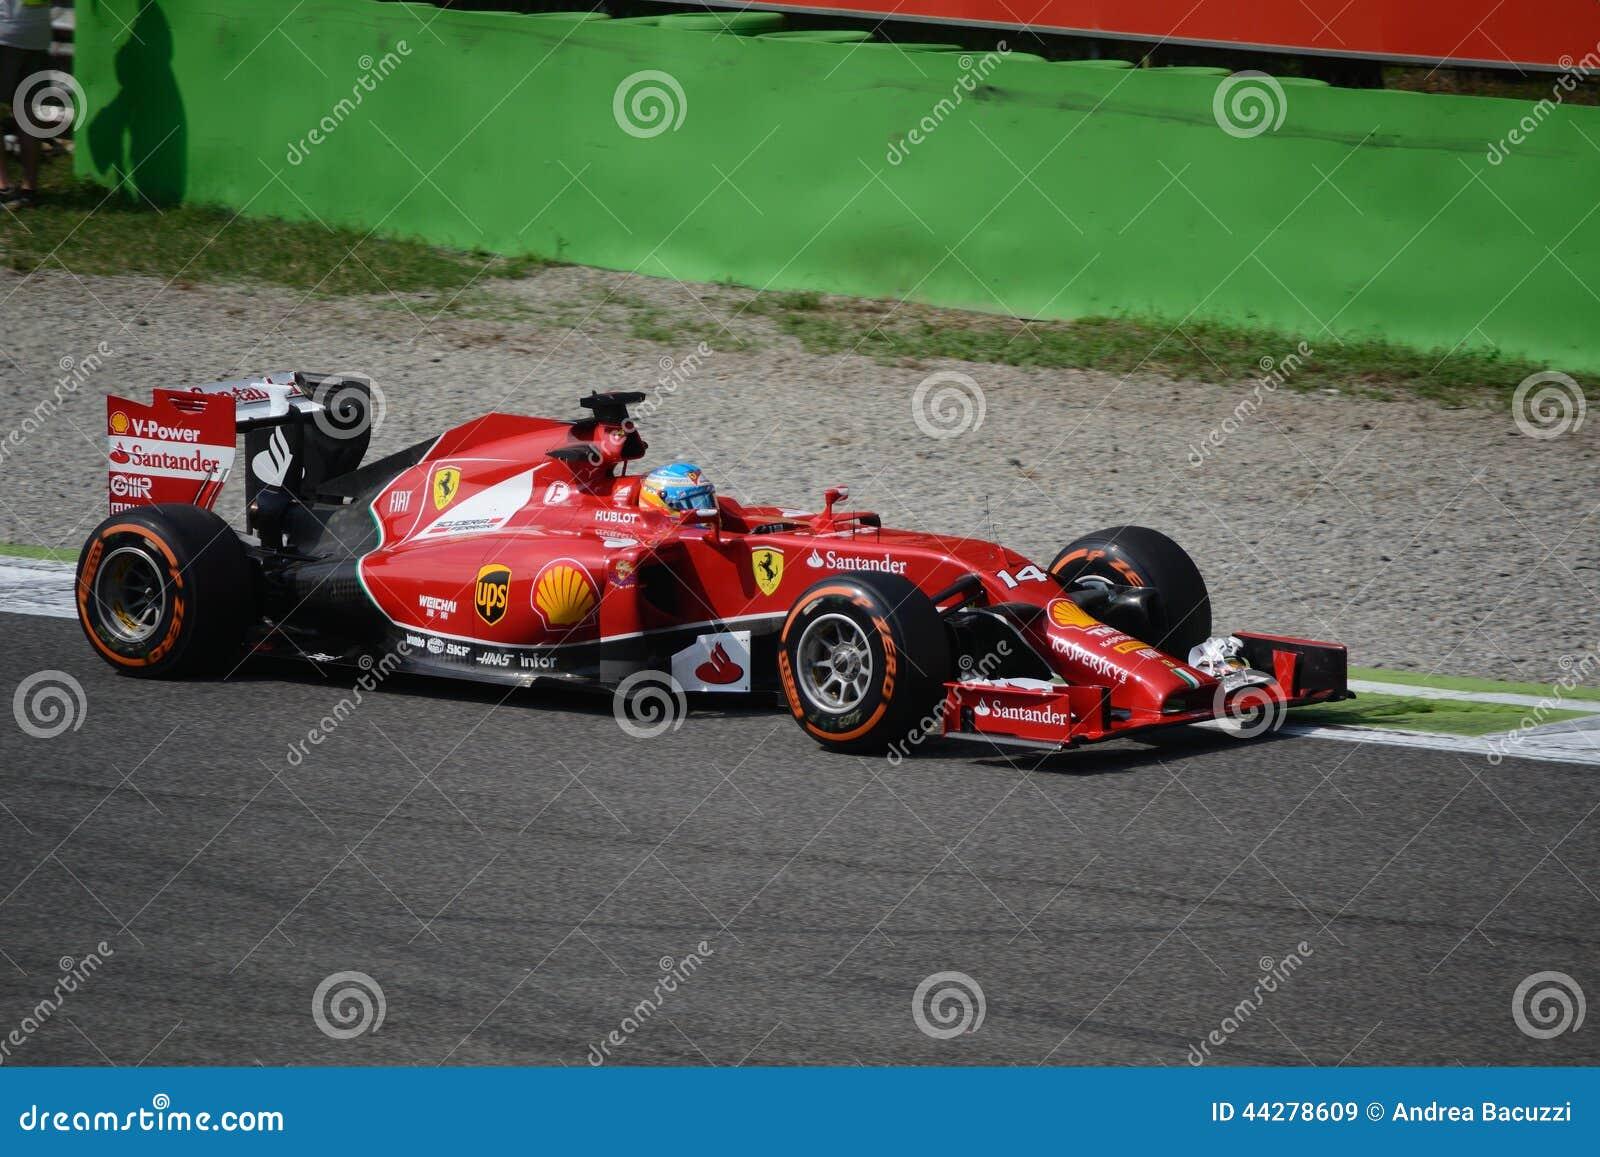 2014 F1 Монца Феррари F14 t - Фернандо Алонсо